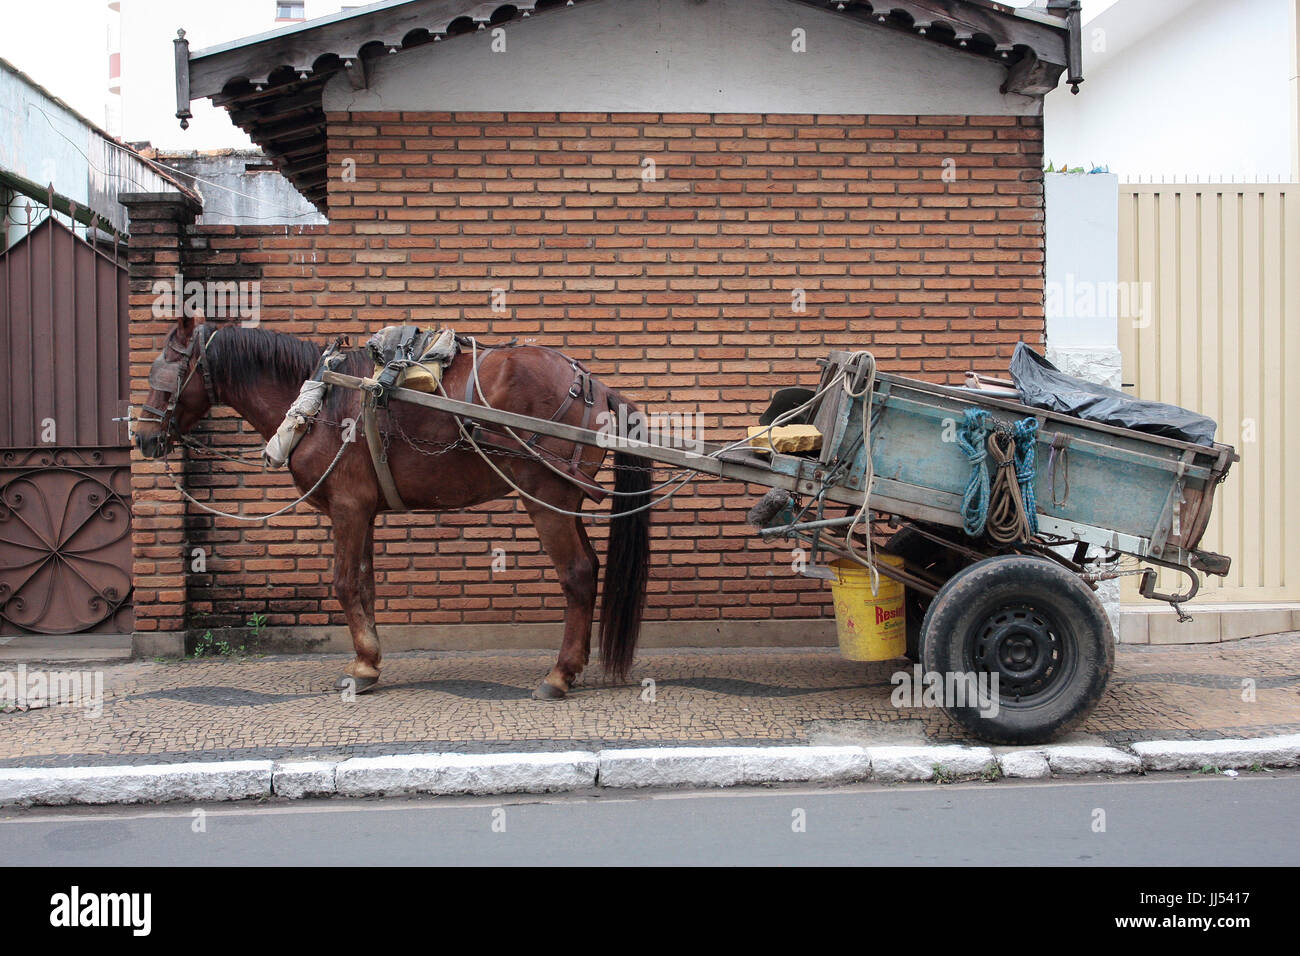 Horse, Coach, Brazil Stock Photo